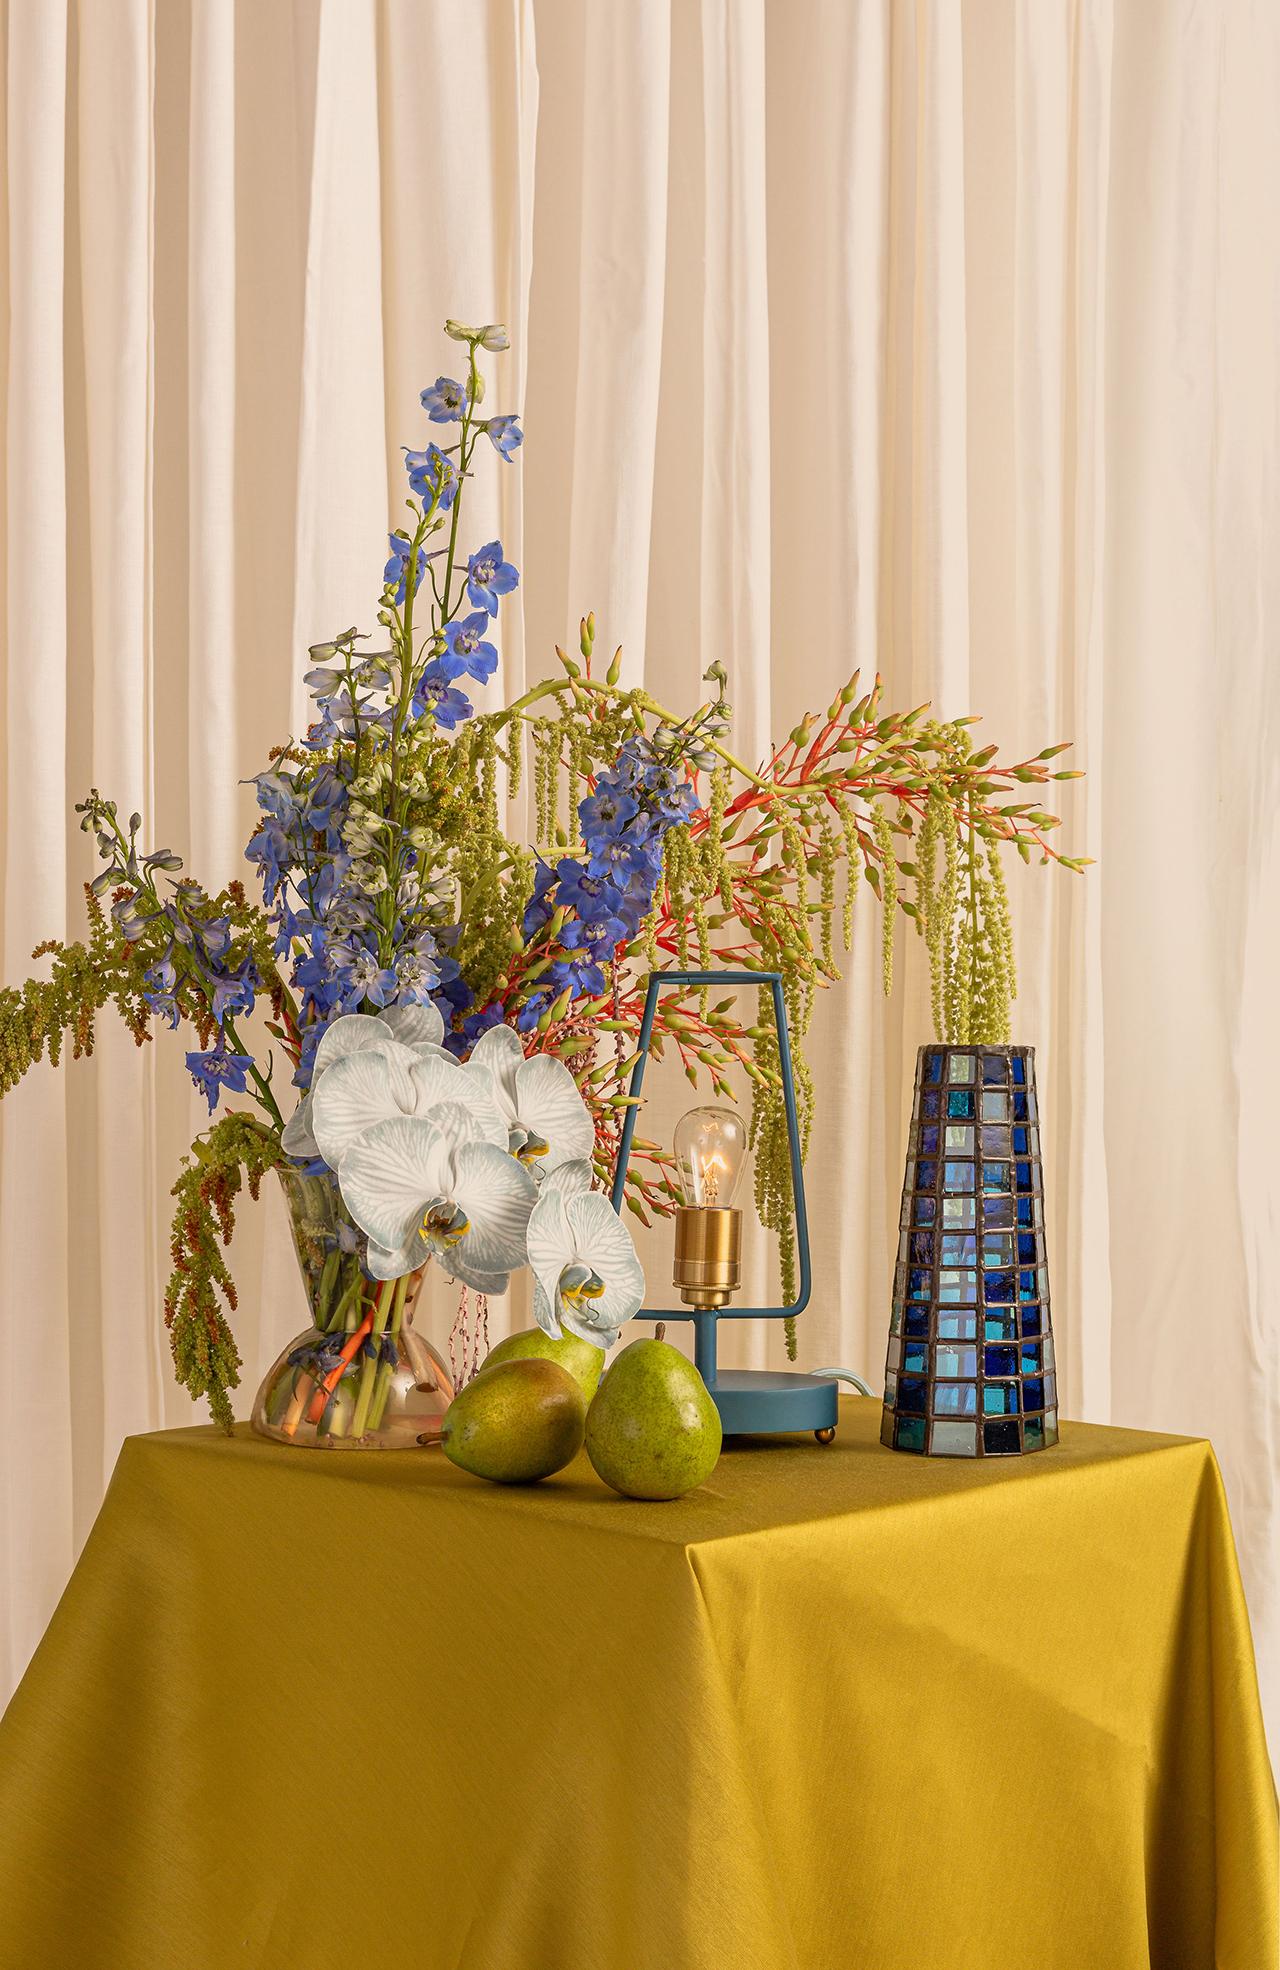 lamp, vase, flowers